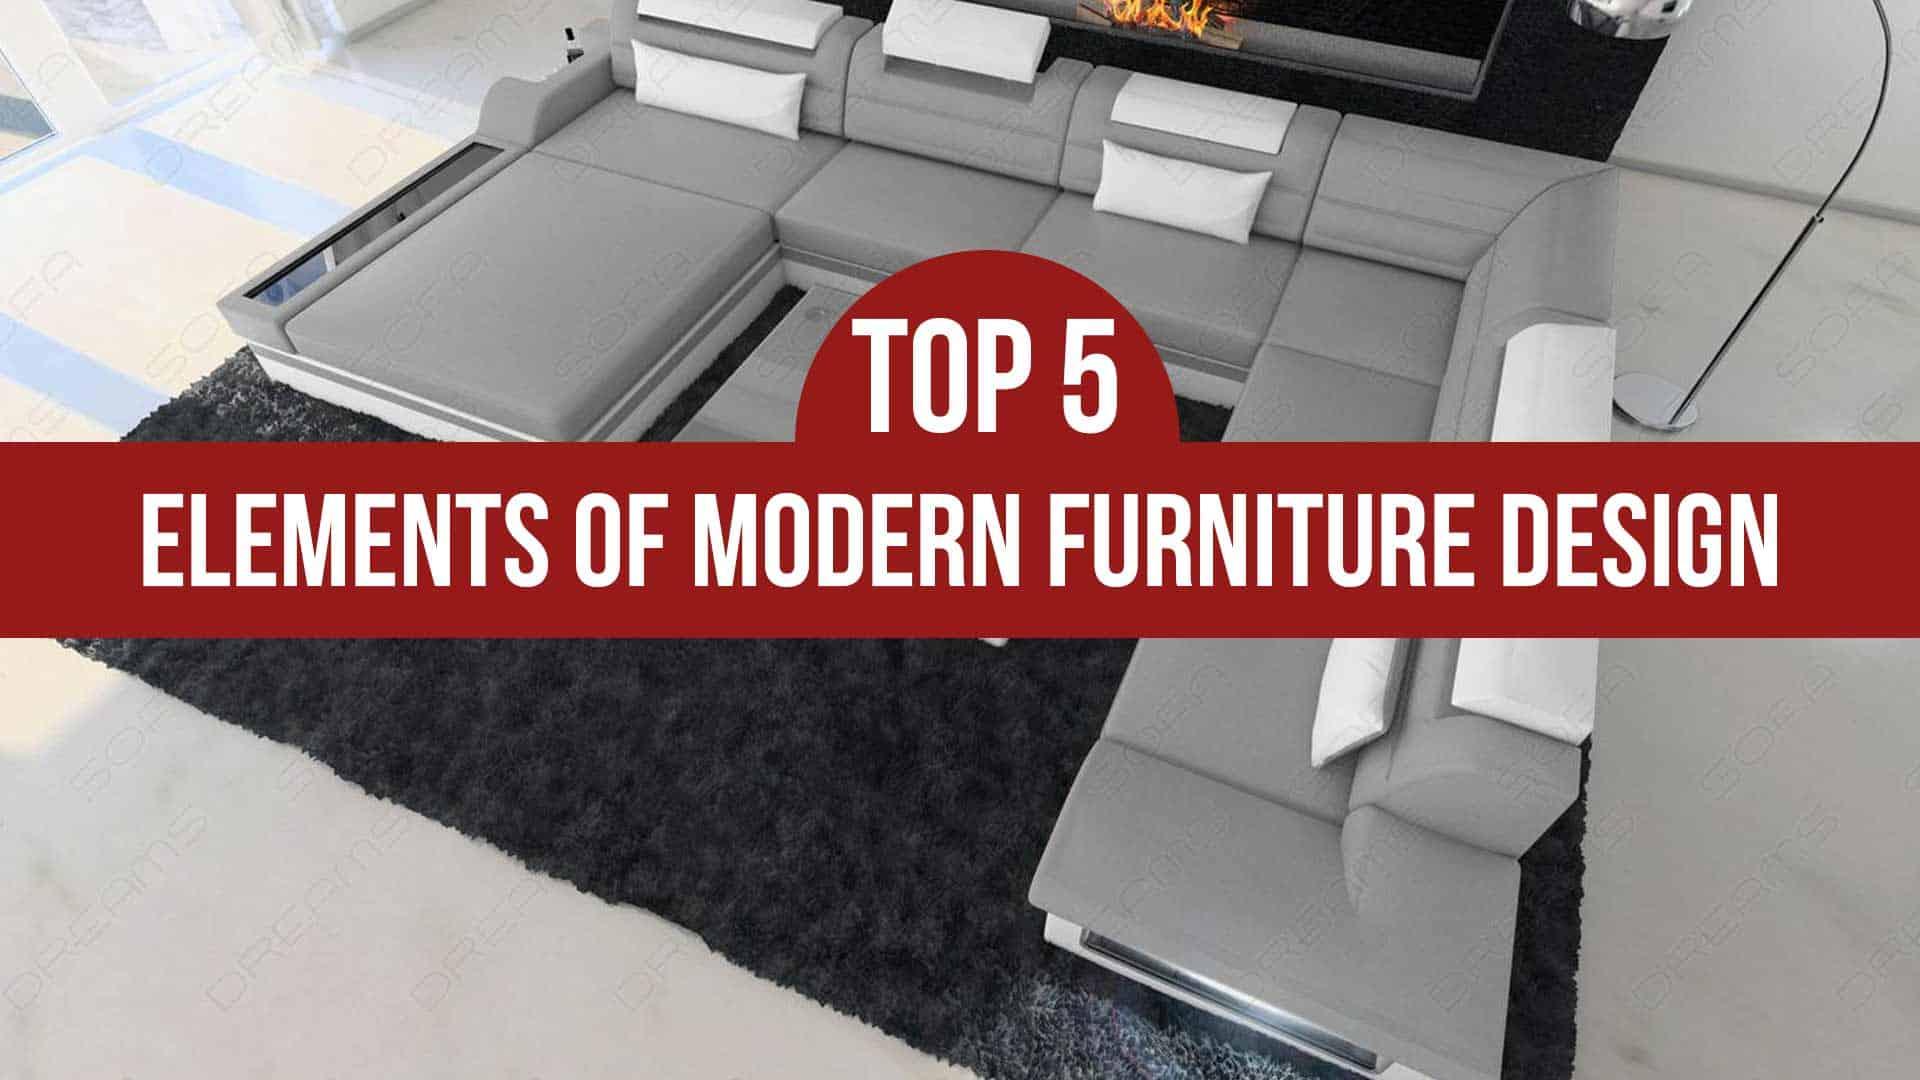 Top 5 Elements of Modern Furniture Design